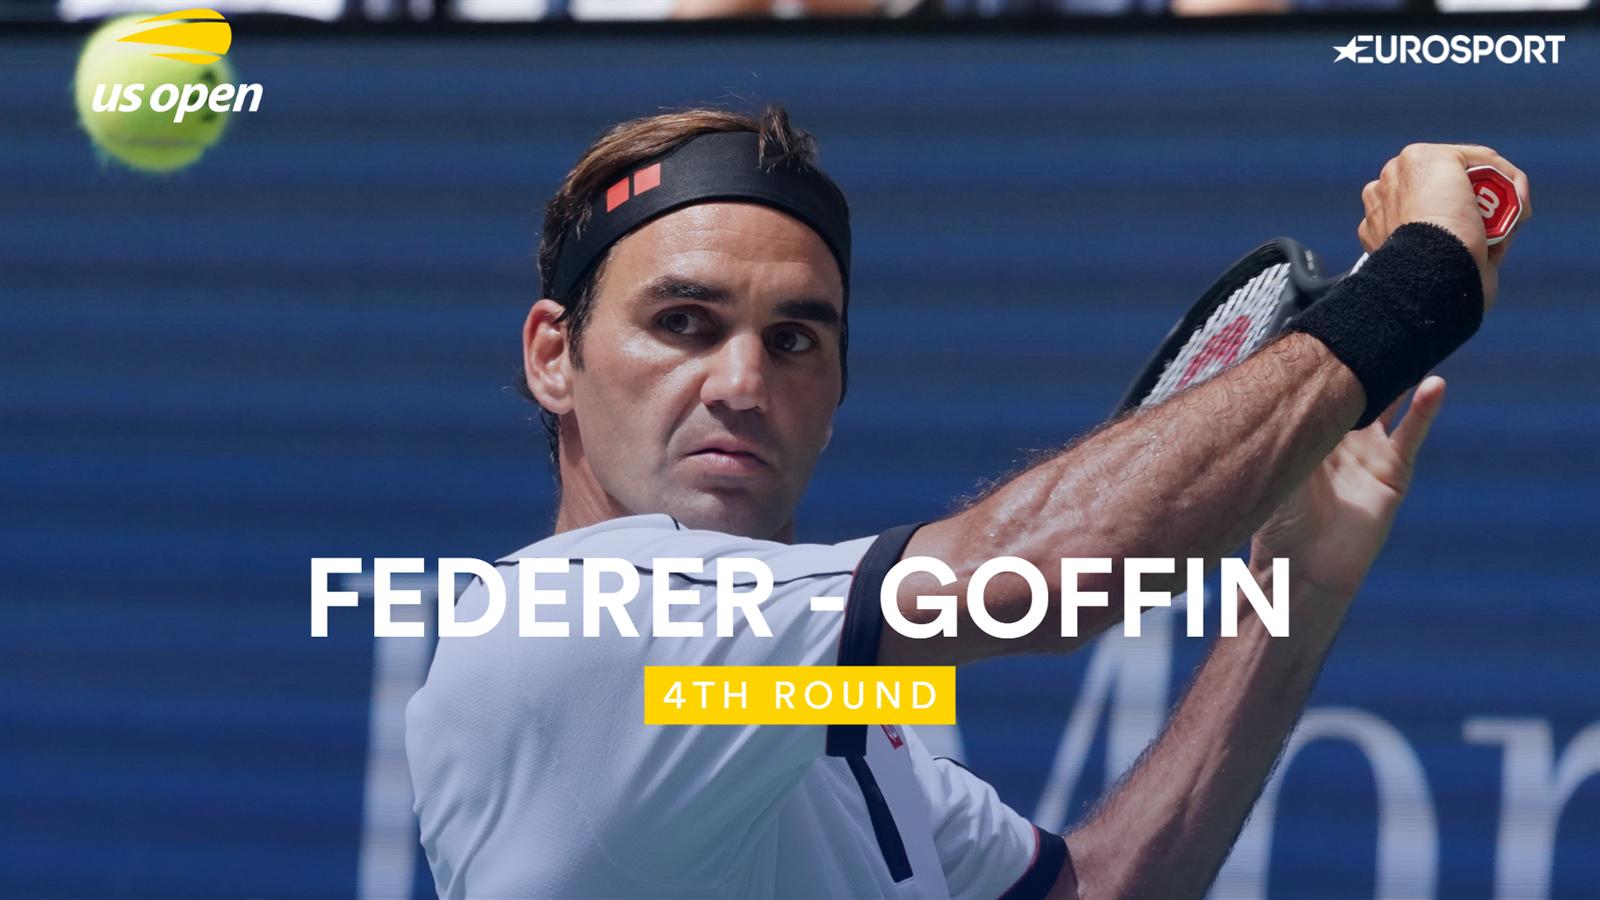 Samenvatting Federer - Goffin US Open